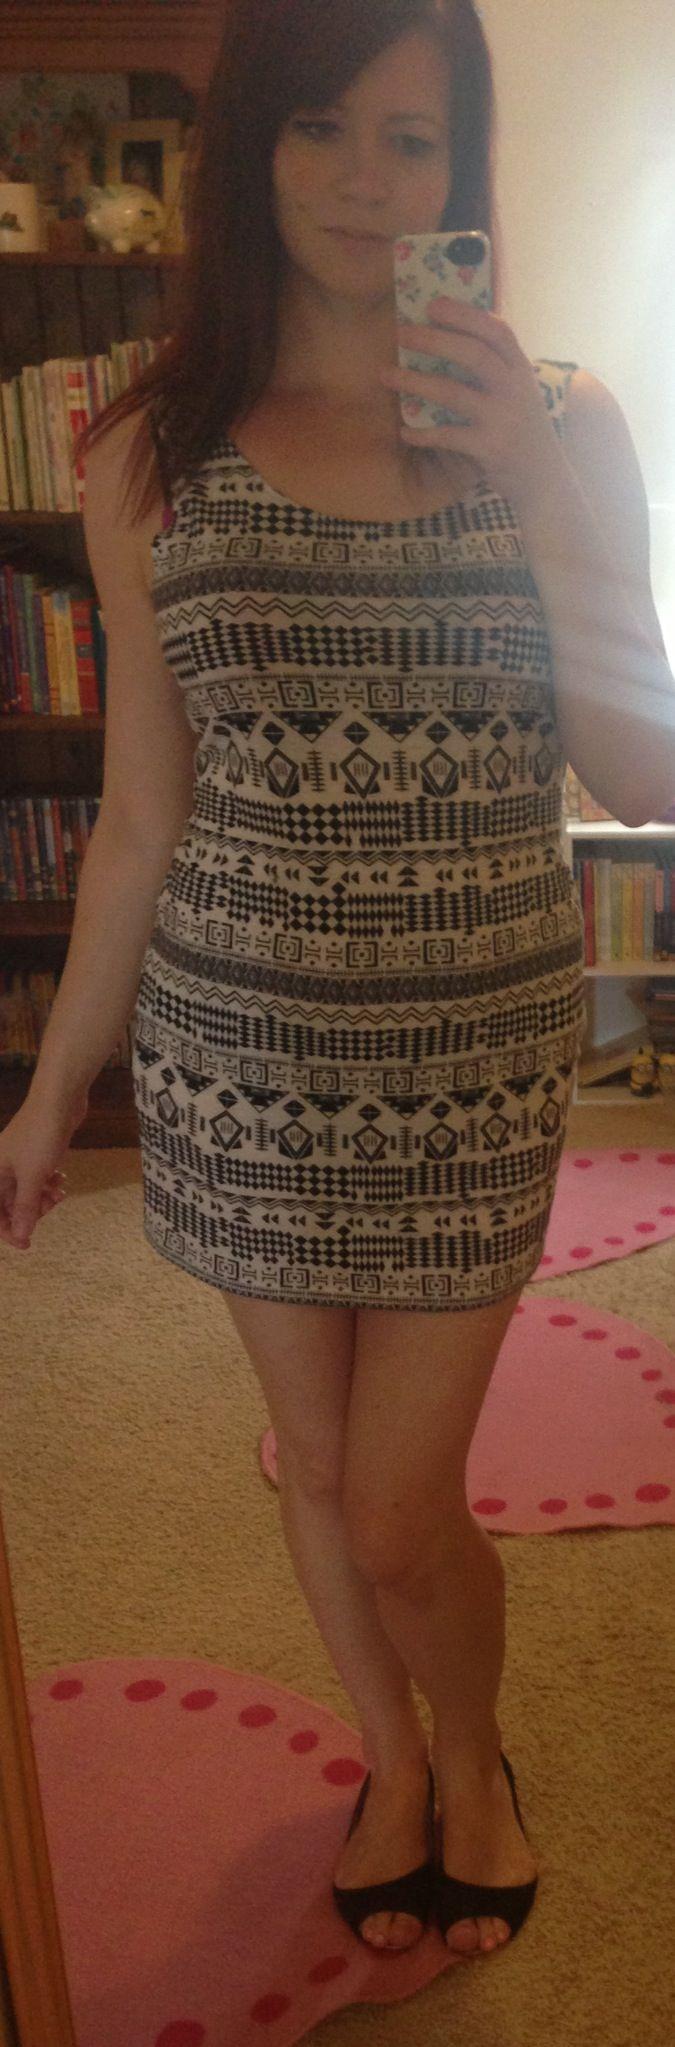 24/9/13 Kenji dress, Rubi flats. I felt just so meh today.